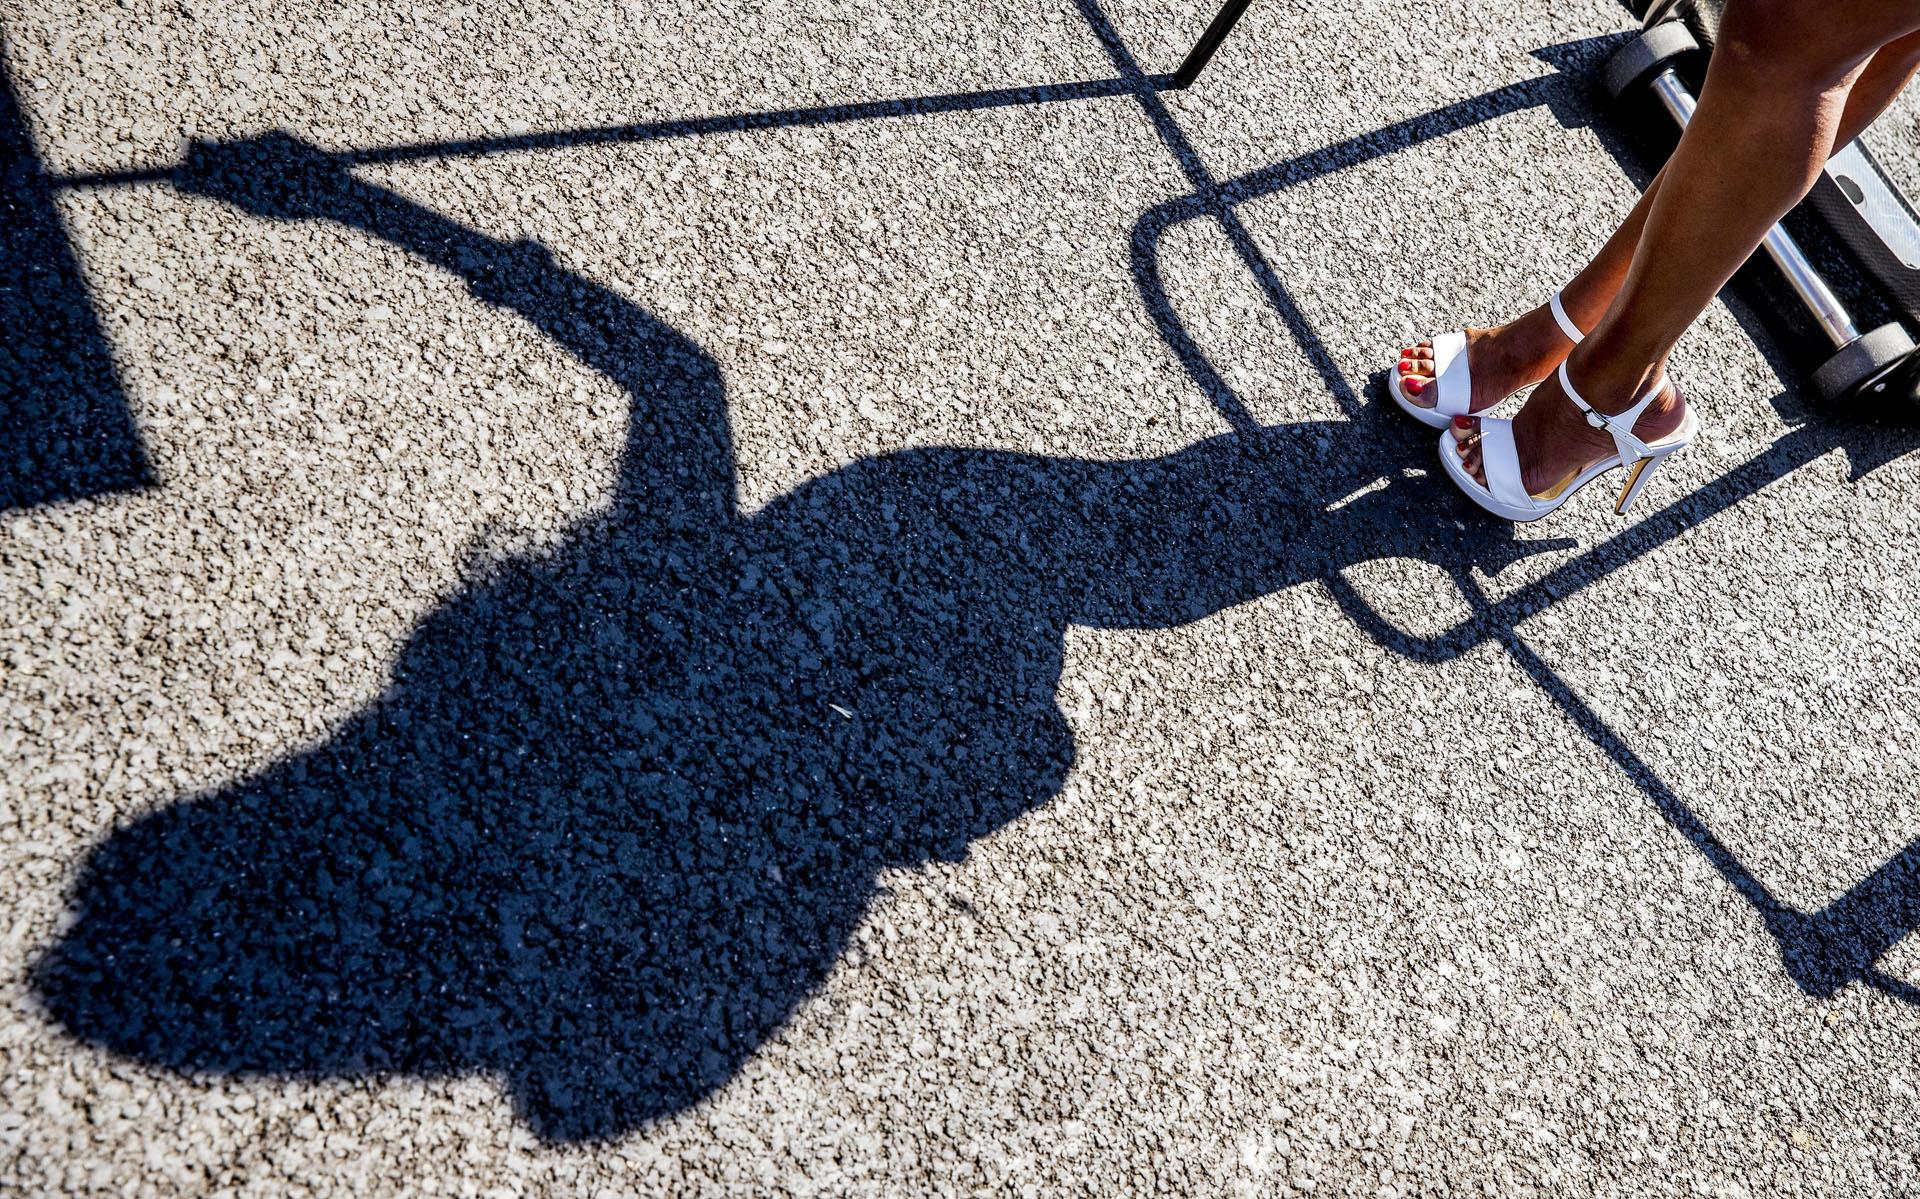 SUKI29. Monza (Italy), 03/09/2017.- Shadow of an Italian Grid girl prior to 2017 Formula One Grand Prix of Italy at the Formula One circuit in Monza, Italy, 03 September 2017. (Fórmula Uno, Italia) EFE/EPA/SRDJAN SUKI